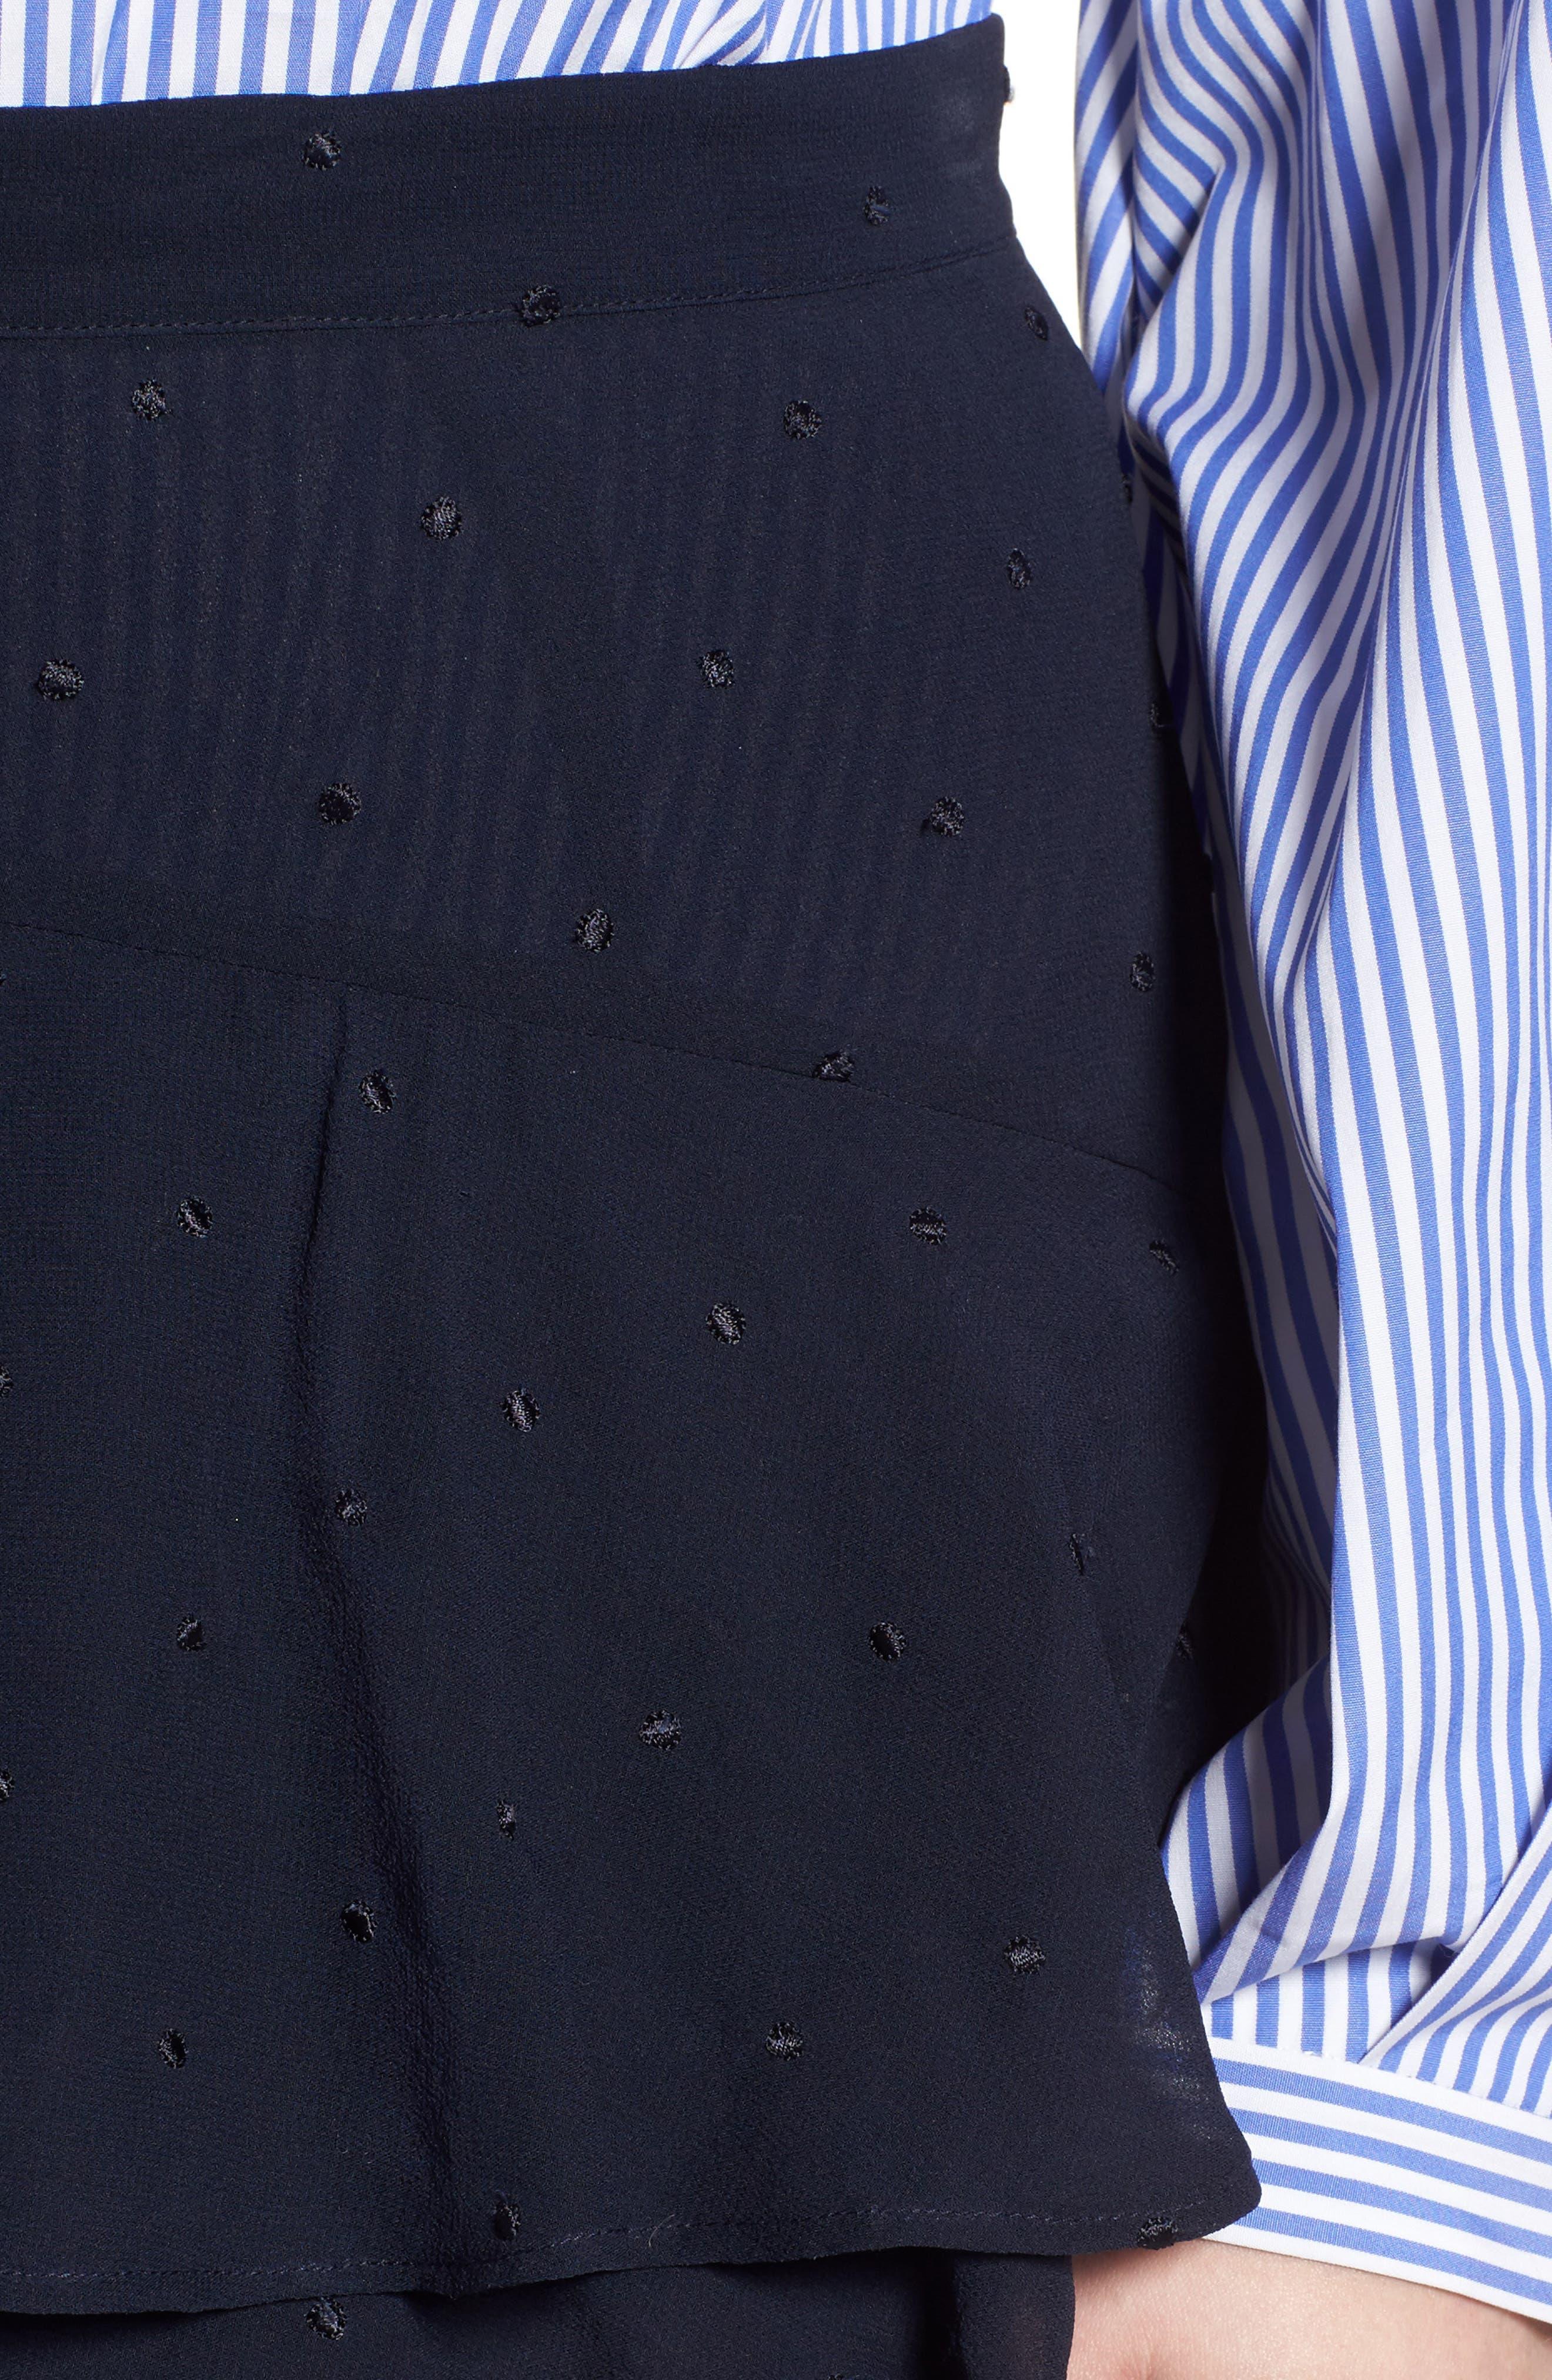 Tiered Silk Chiffon Skirt,                             Alternate thumbnail 5, color,                             Navy Night